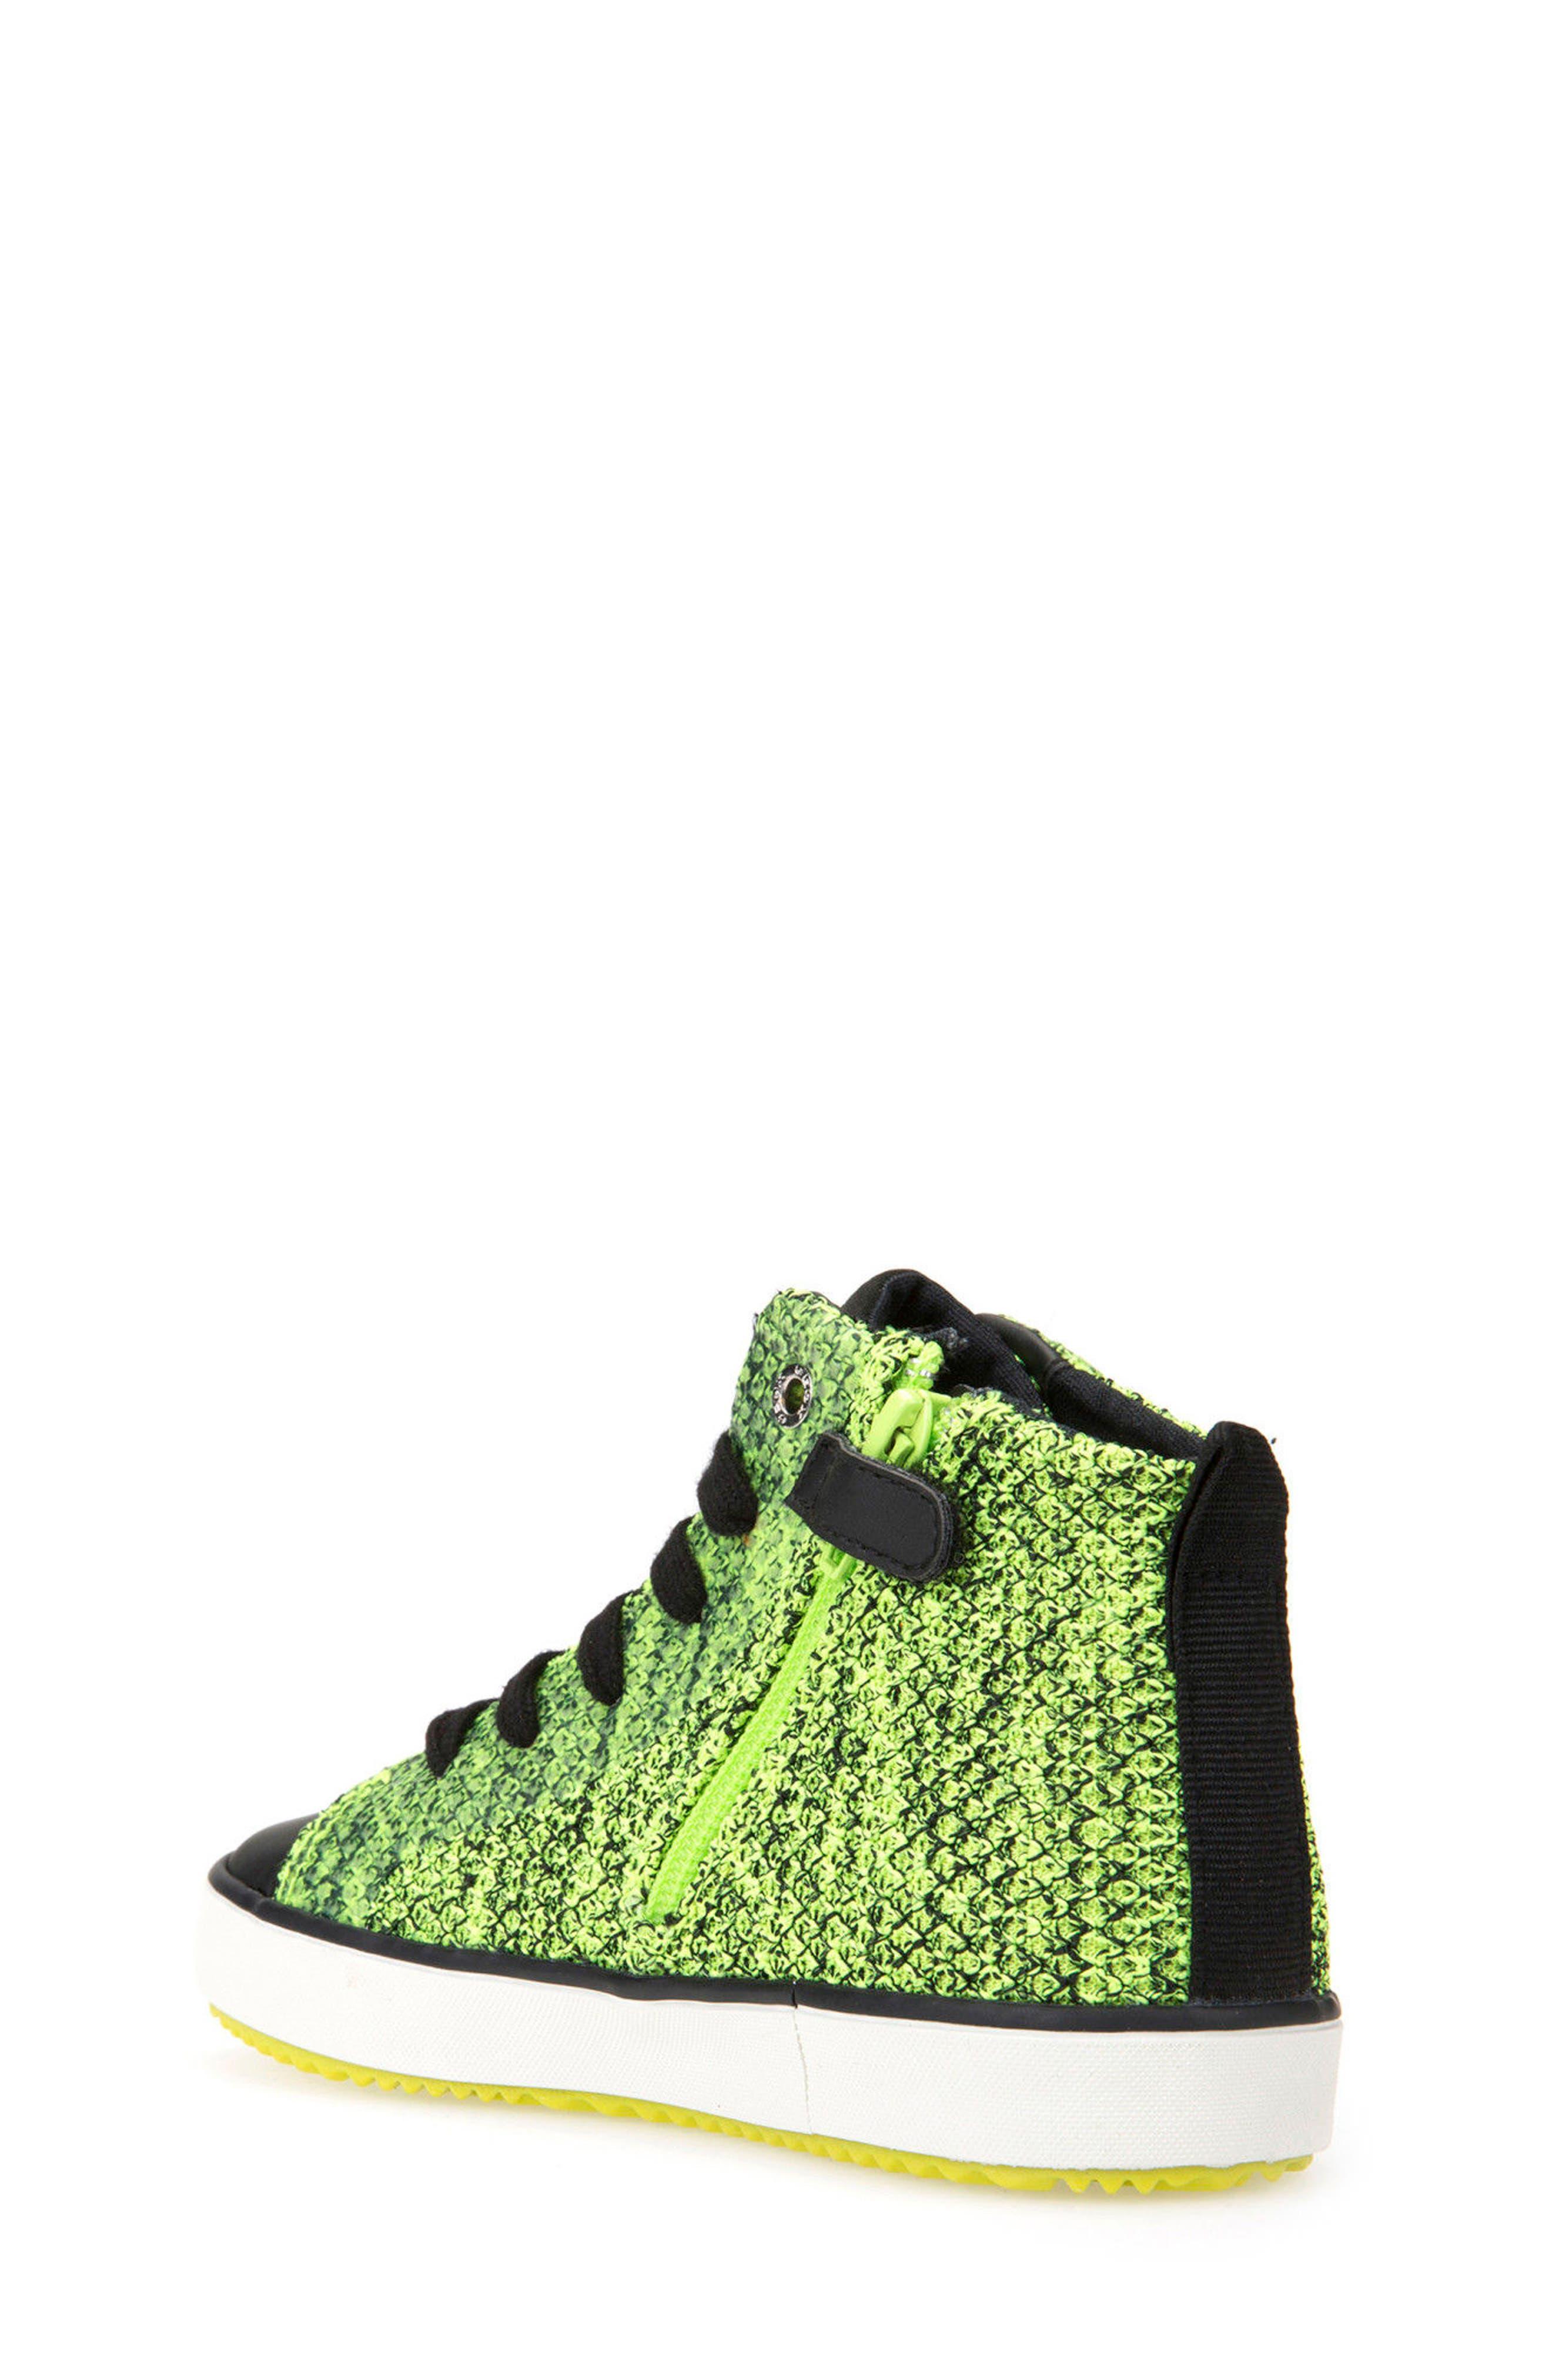 Alonisso Knit Mid Top Sneaker,                             Alternate thumbnail 2, color,                             Lime/ Black